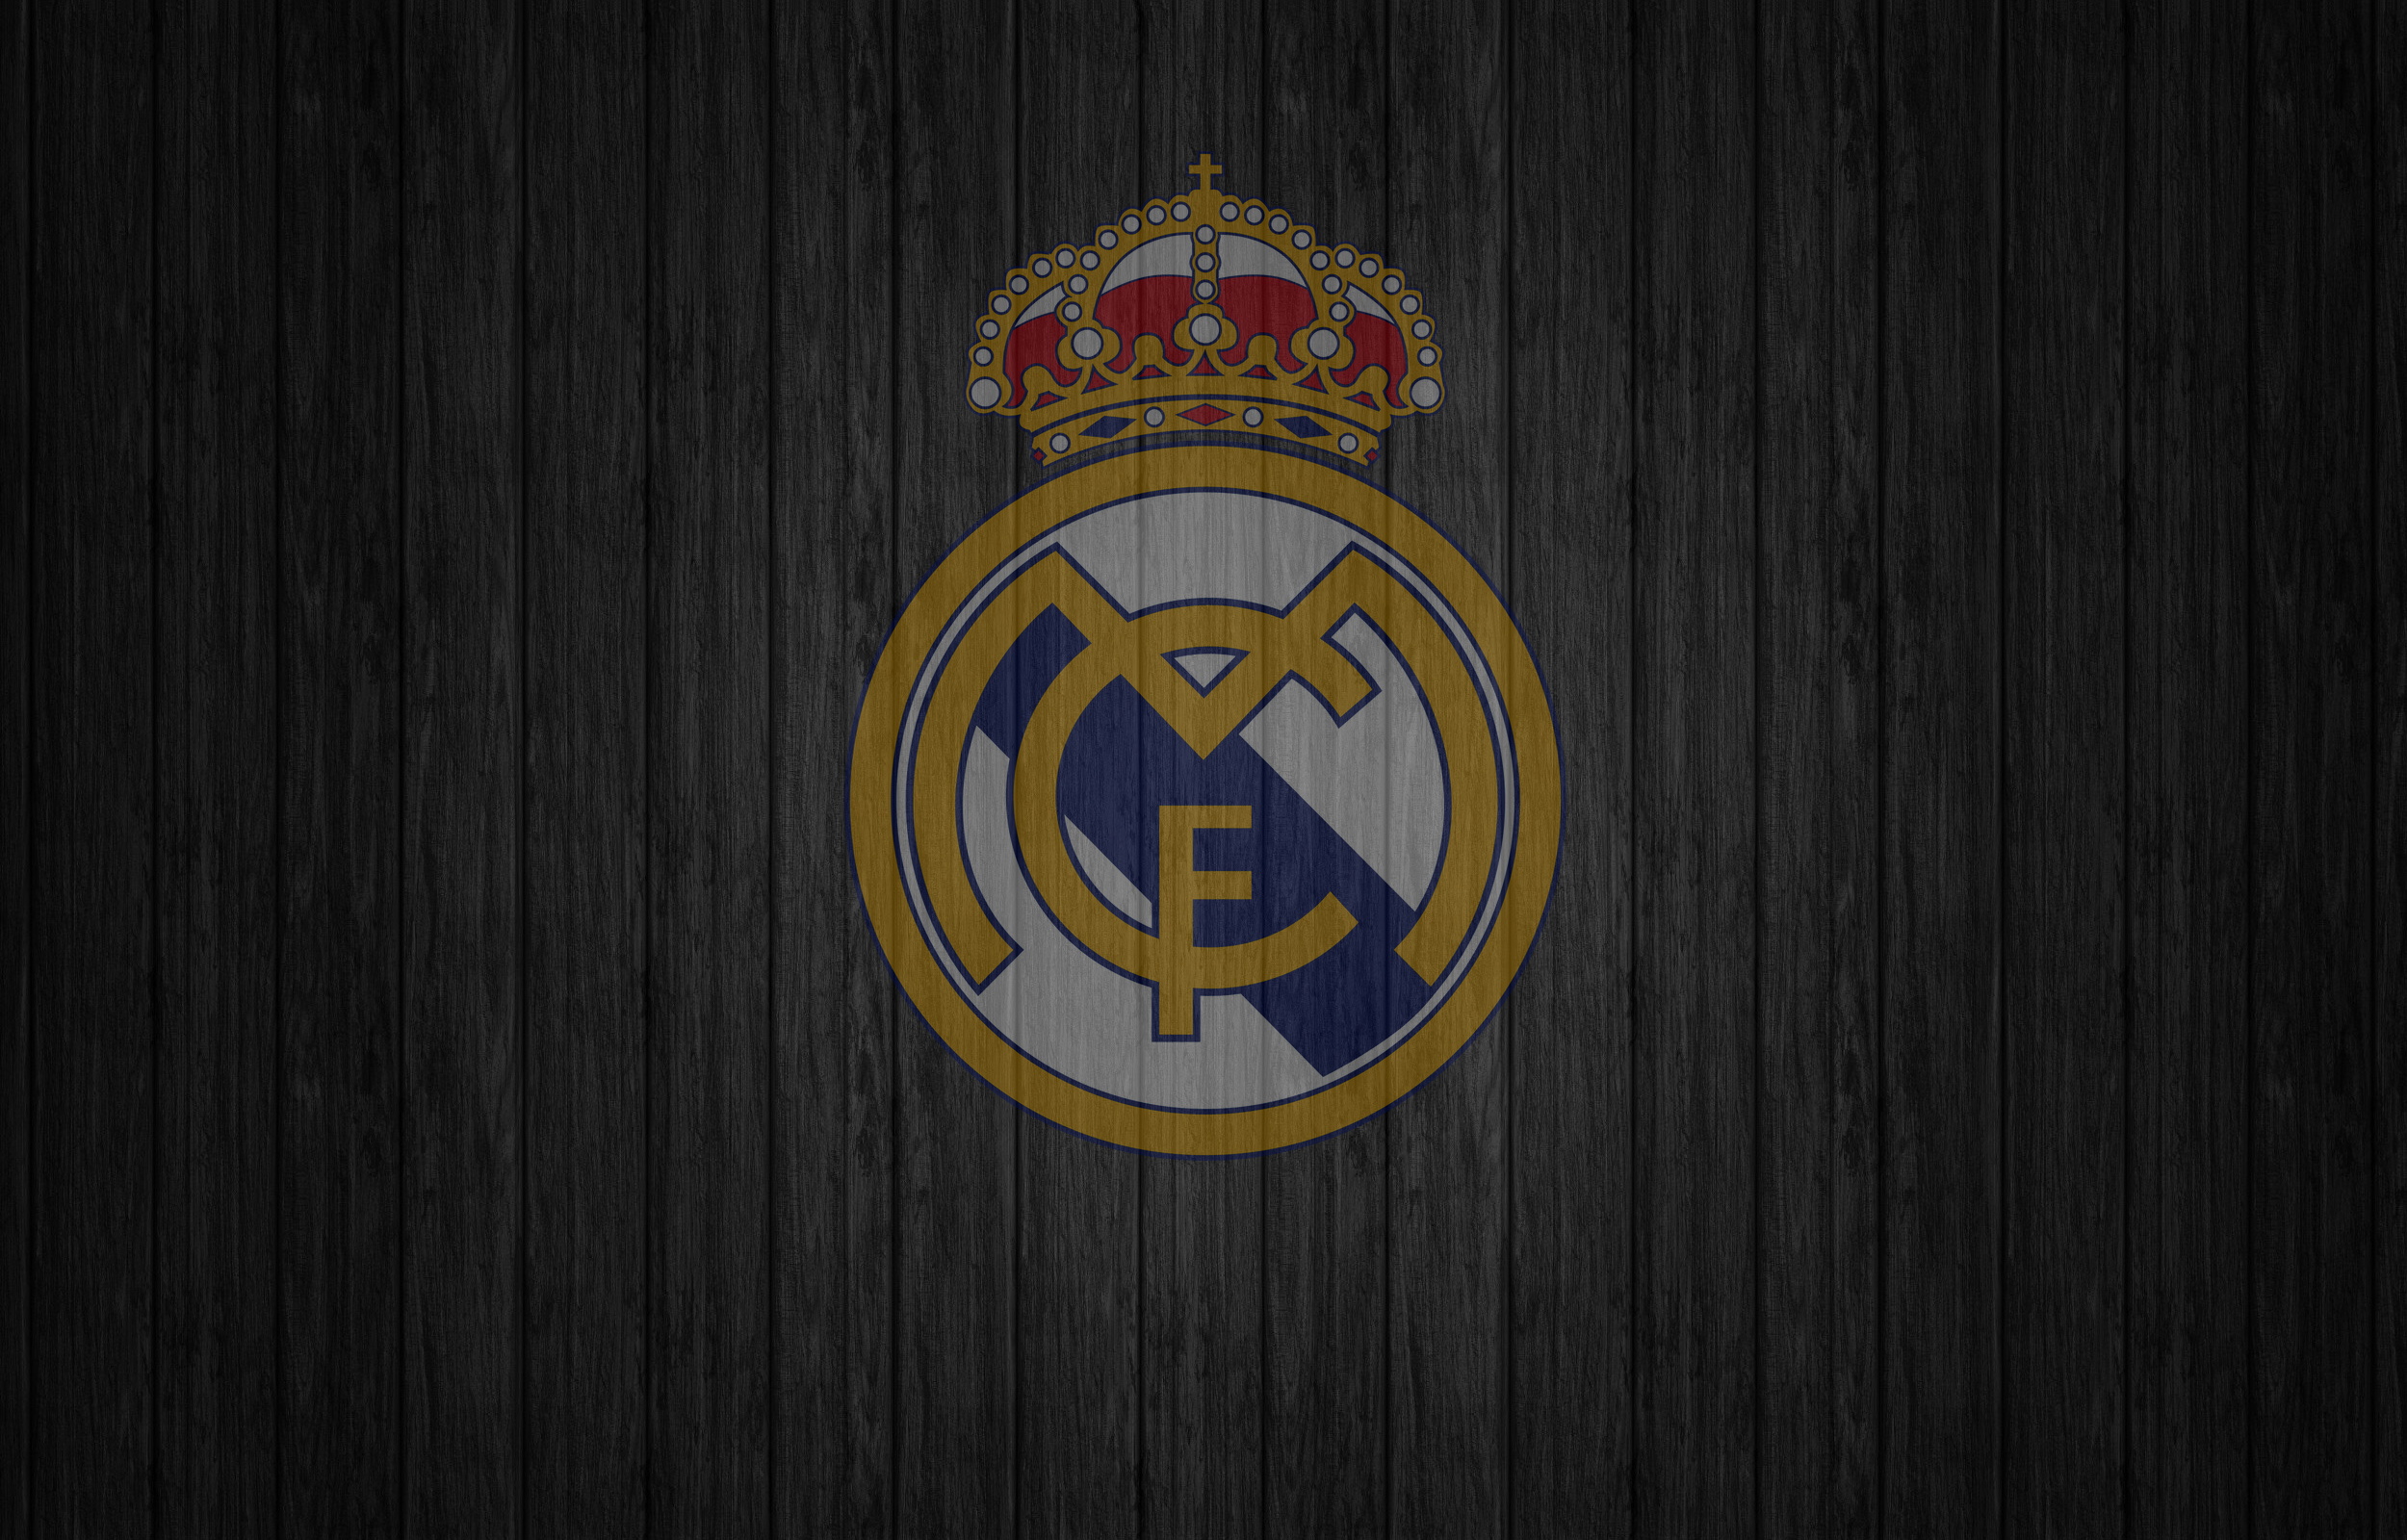 1152x864 Real Madrid Cf 1152x864 Resolution Hd 4k Wallpapers